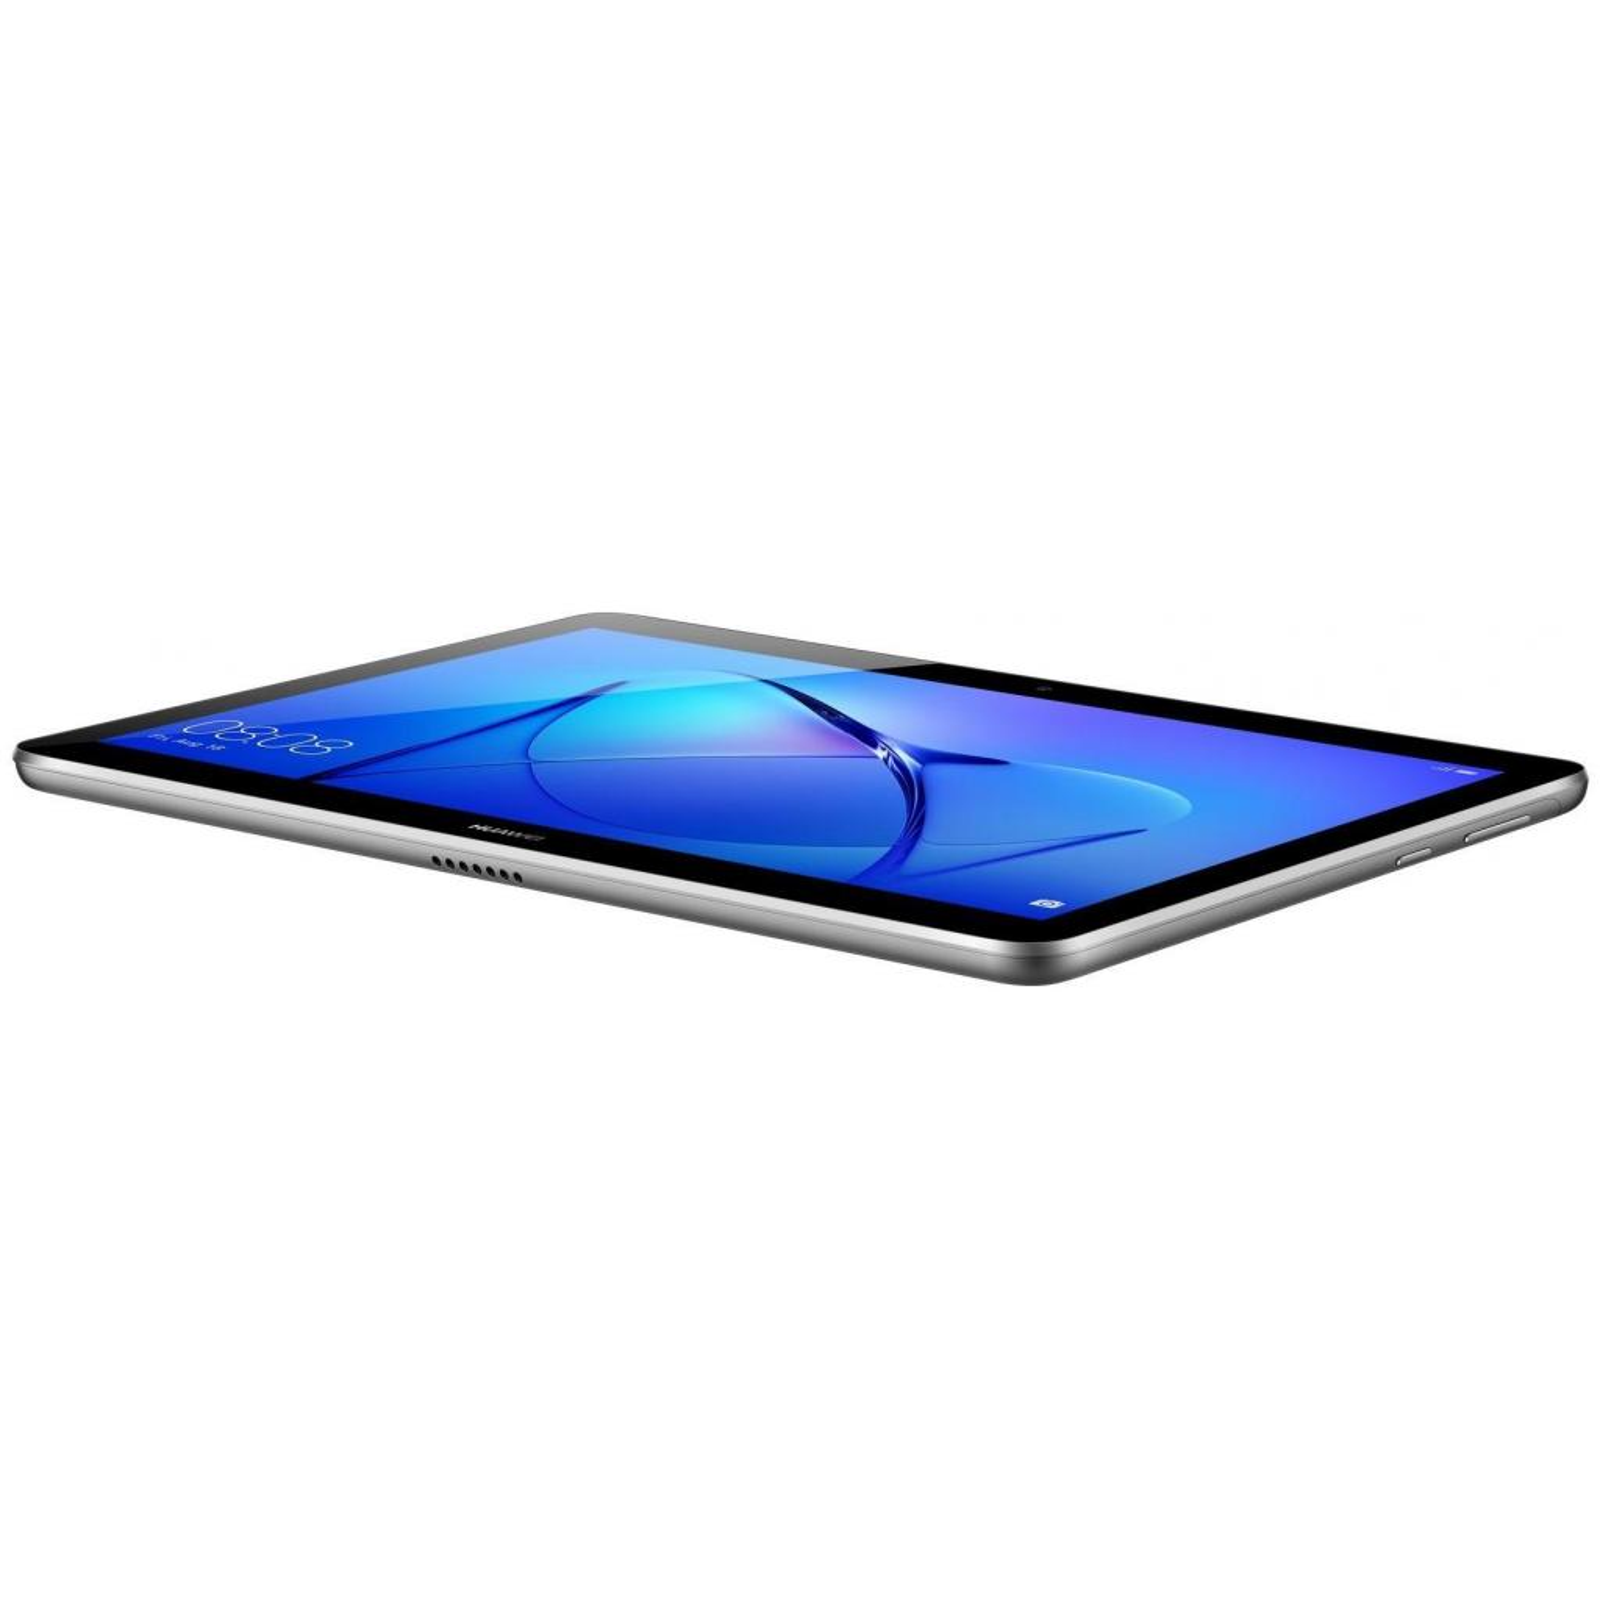 "Планшет Huawei MediaPad T3 10"" Wi-Fi (AGS-W09) Space Grey (53018520) изображение 6"